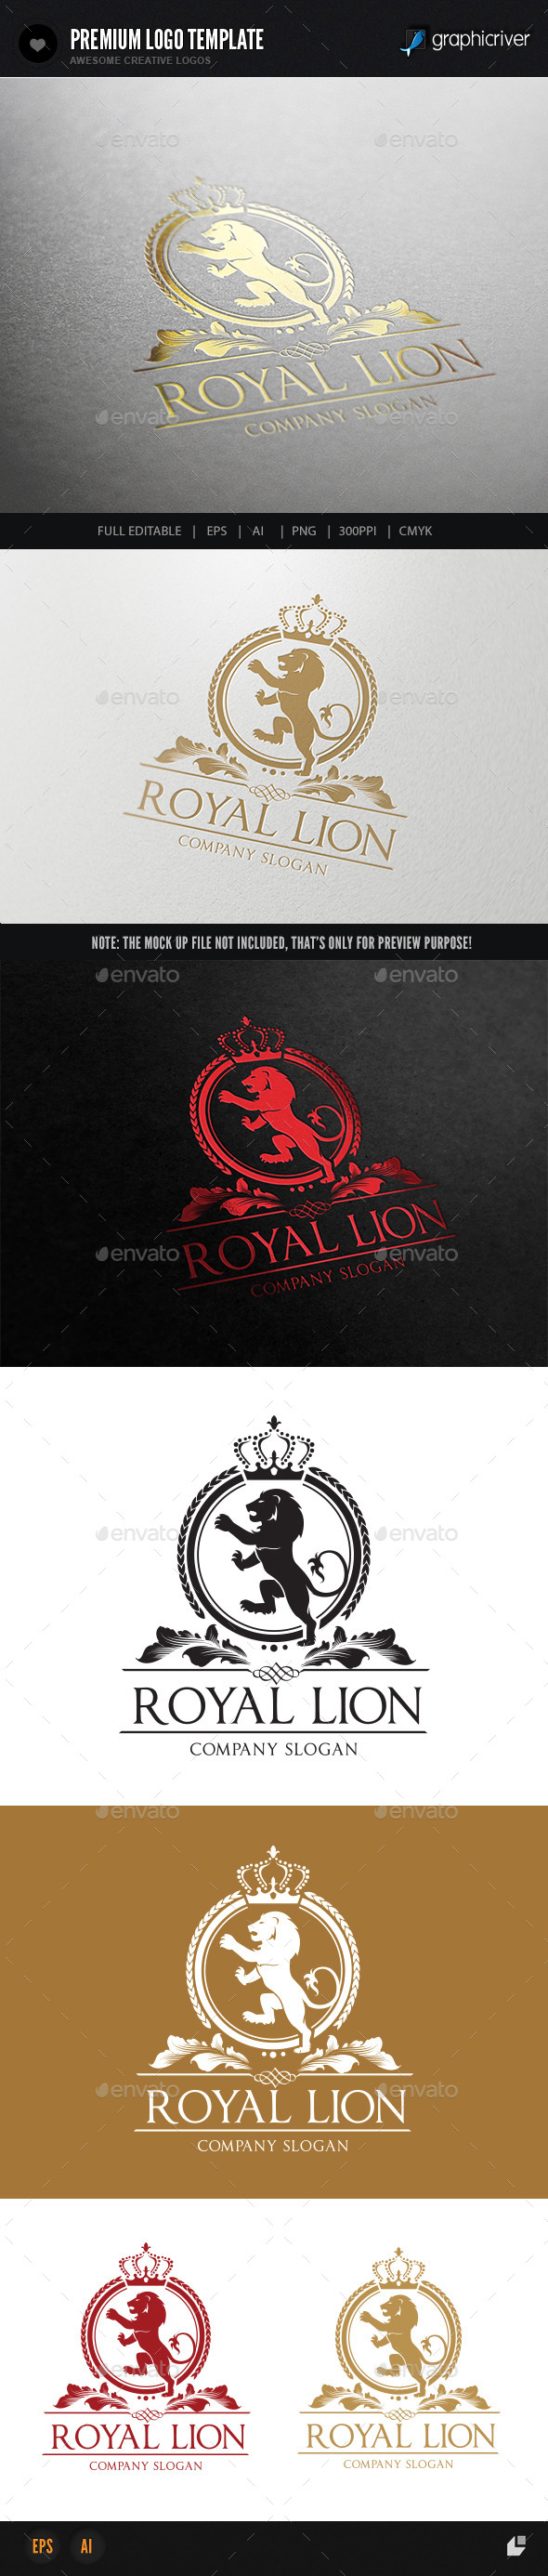 GraphicRiver Royal Lion 9007702